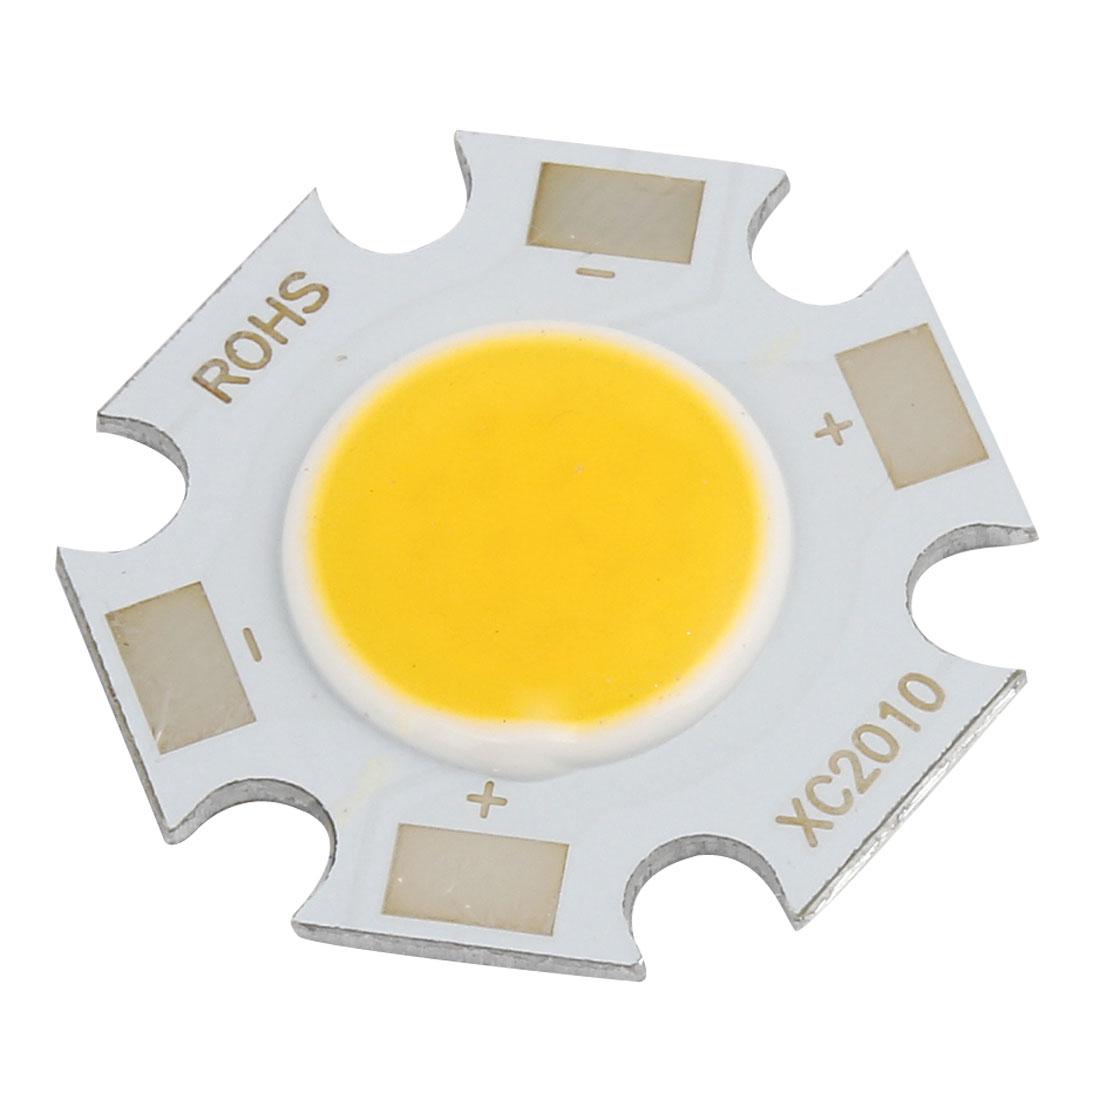 15-17V 300mA 5W Warm White Light High Power SMD COB LED Lamp Chip Bulb